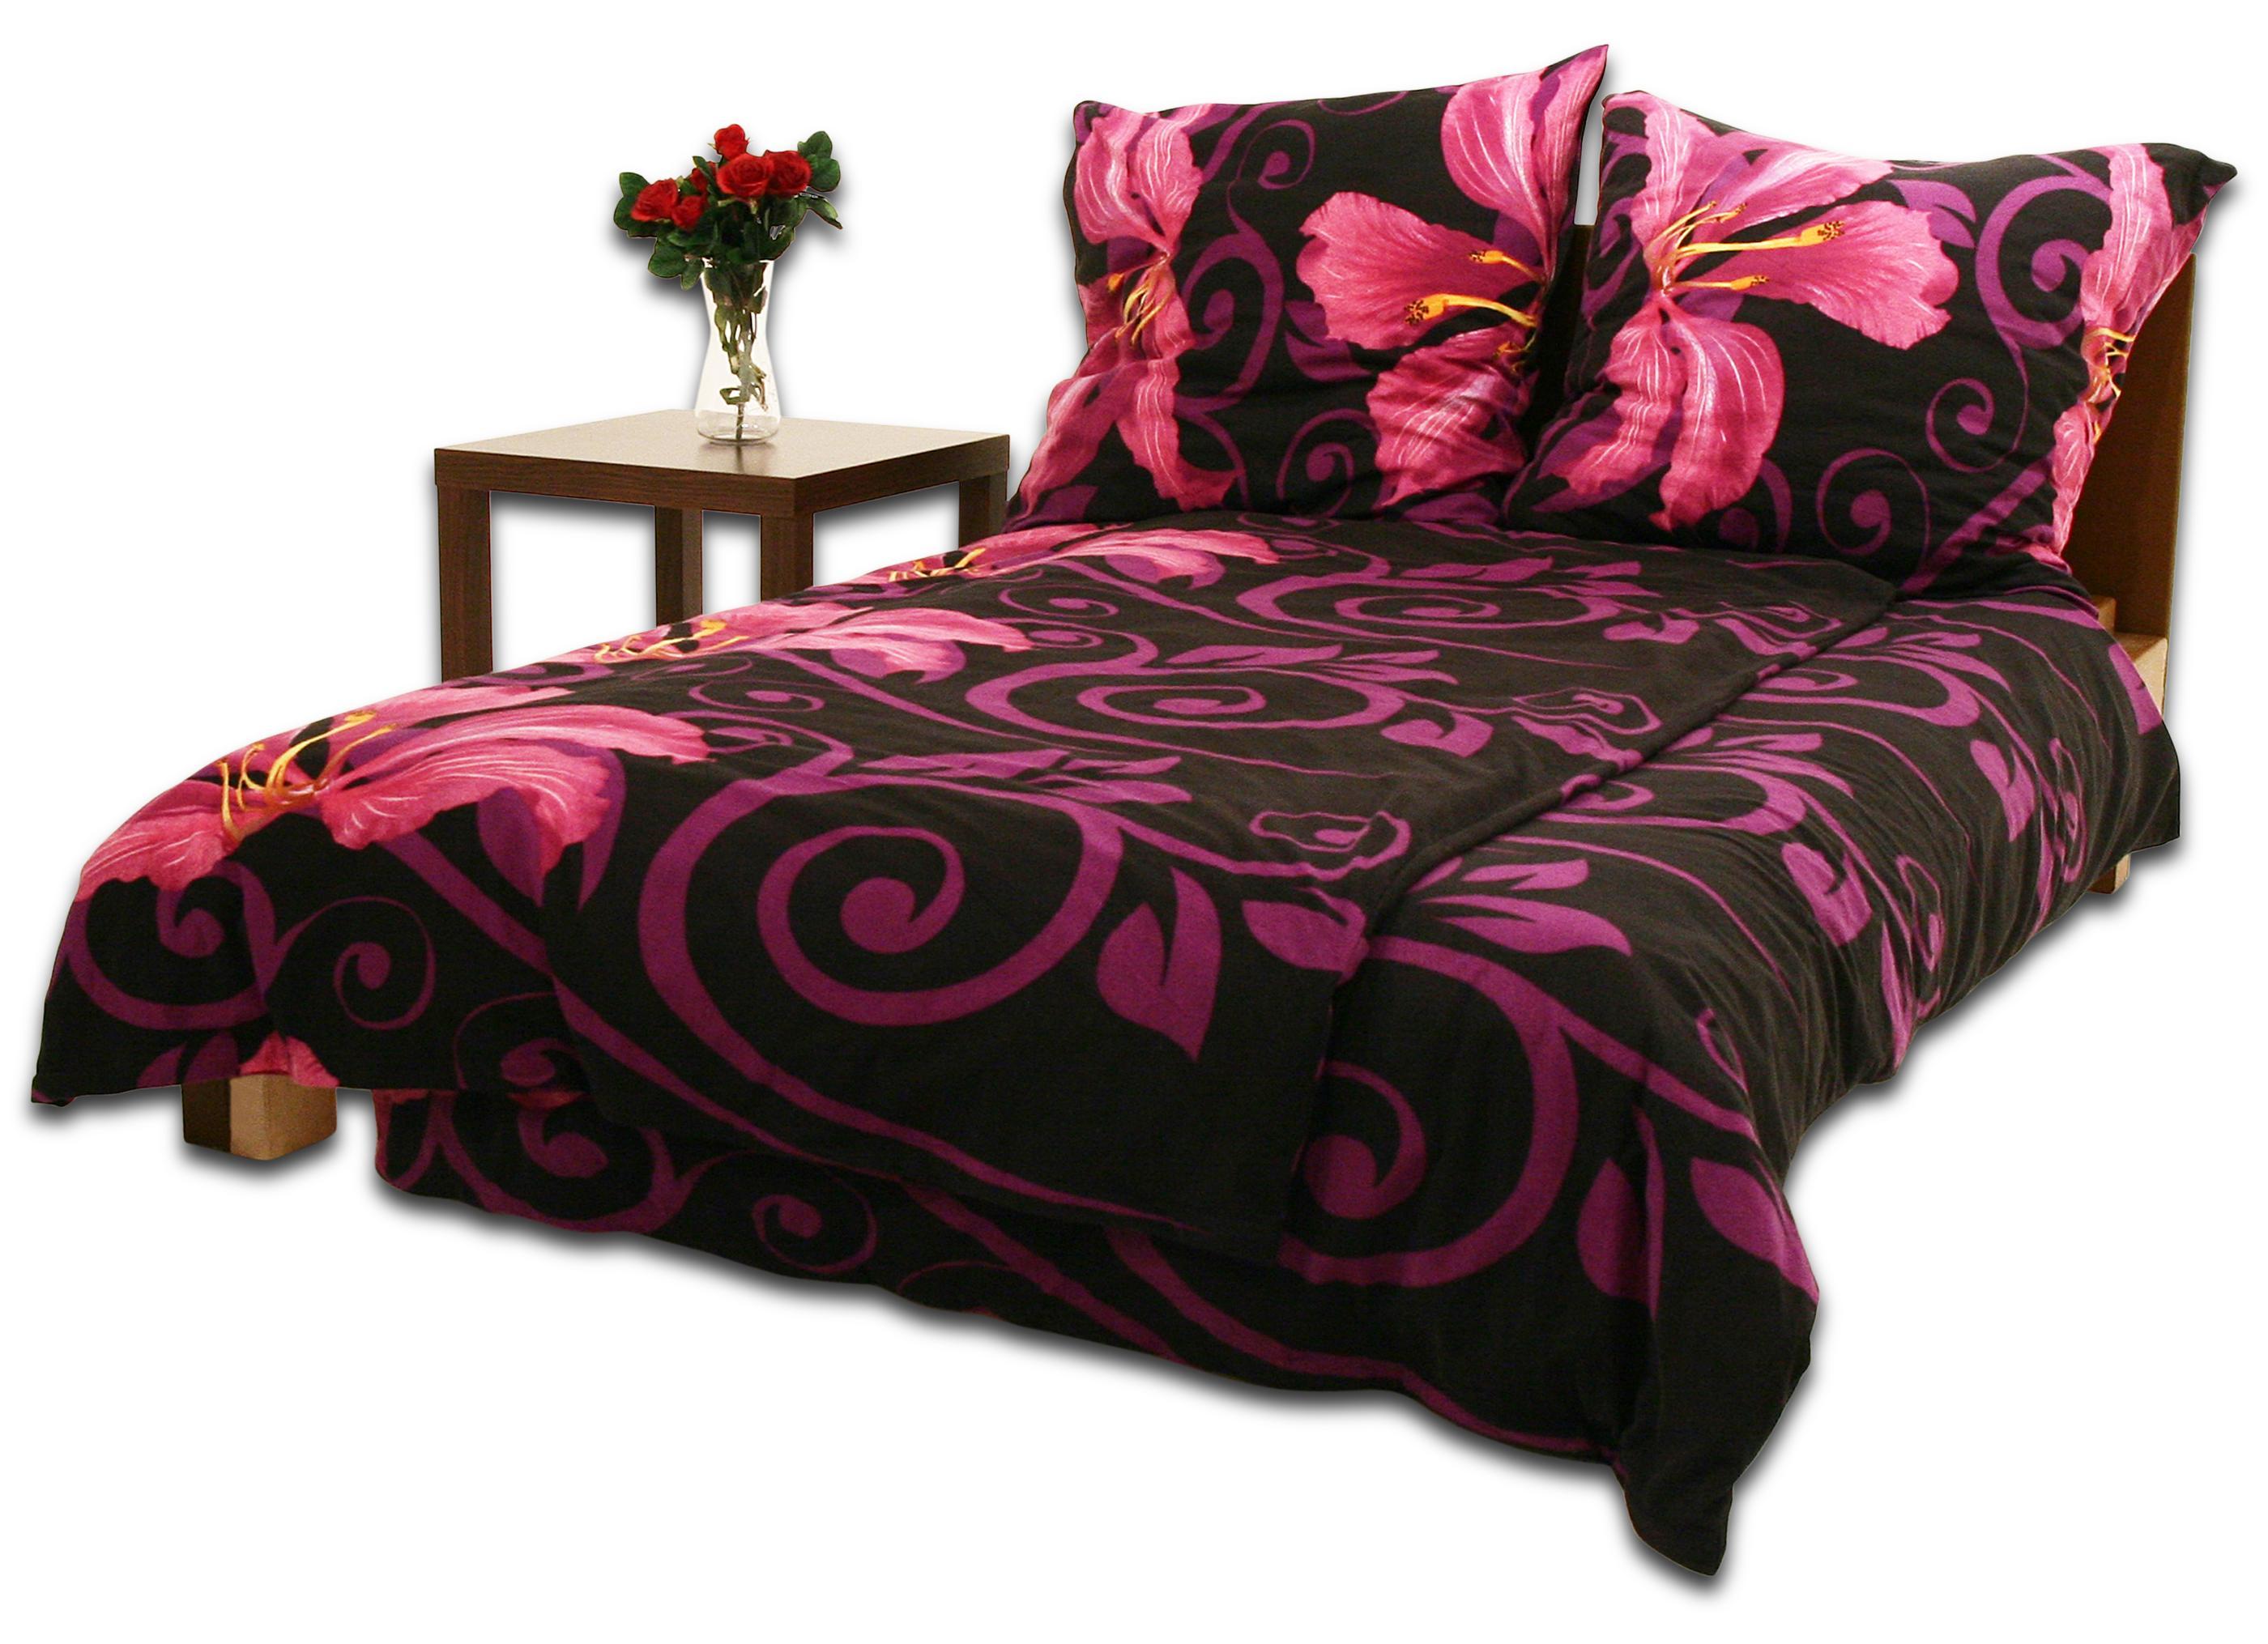 sale 1 2 den preis bestimmen sie. Black Bedroom Furniture Sets. Home Design Ideas